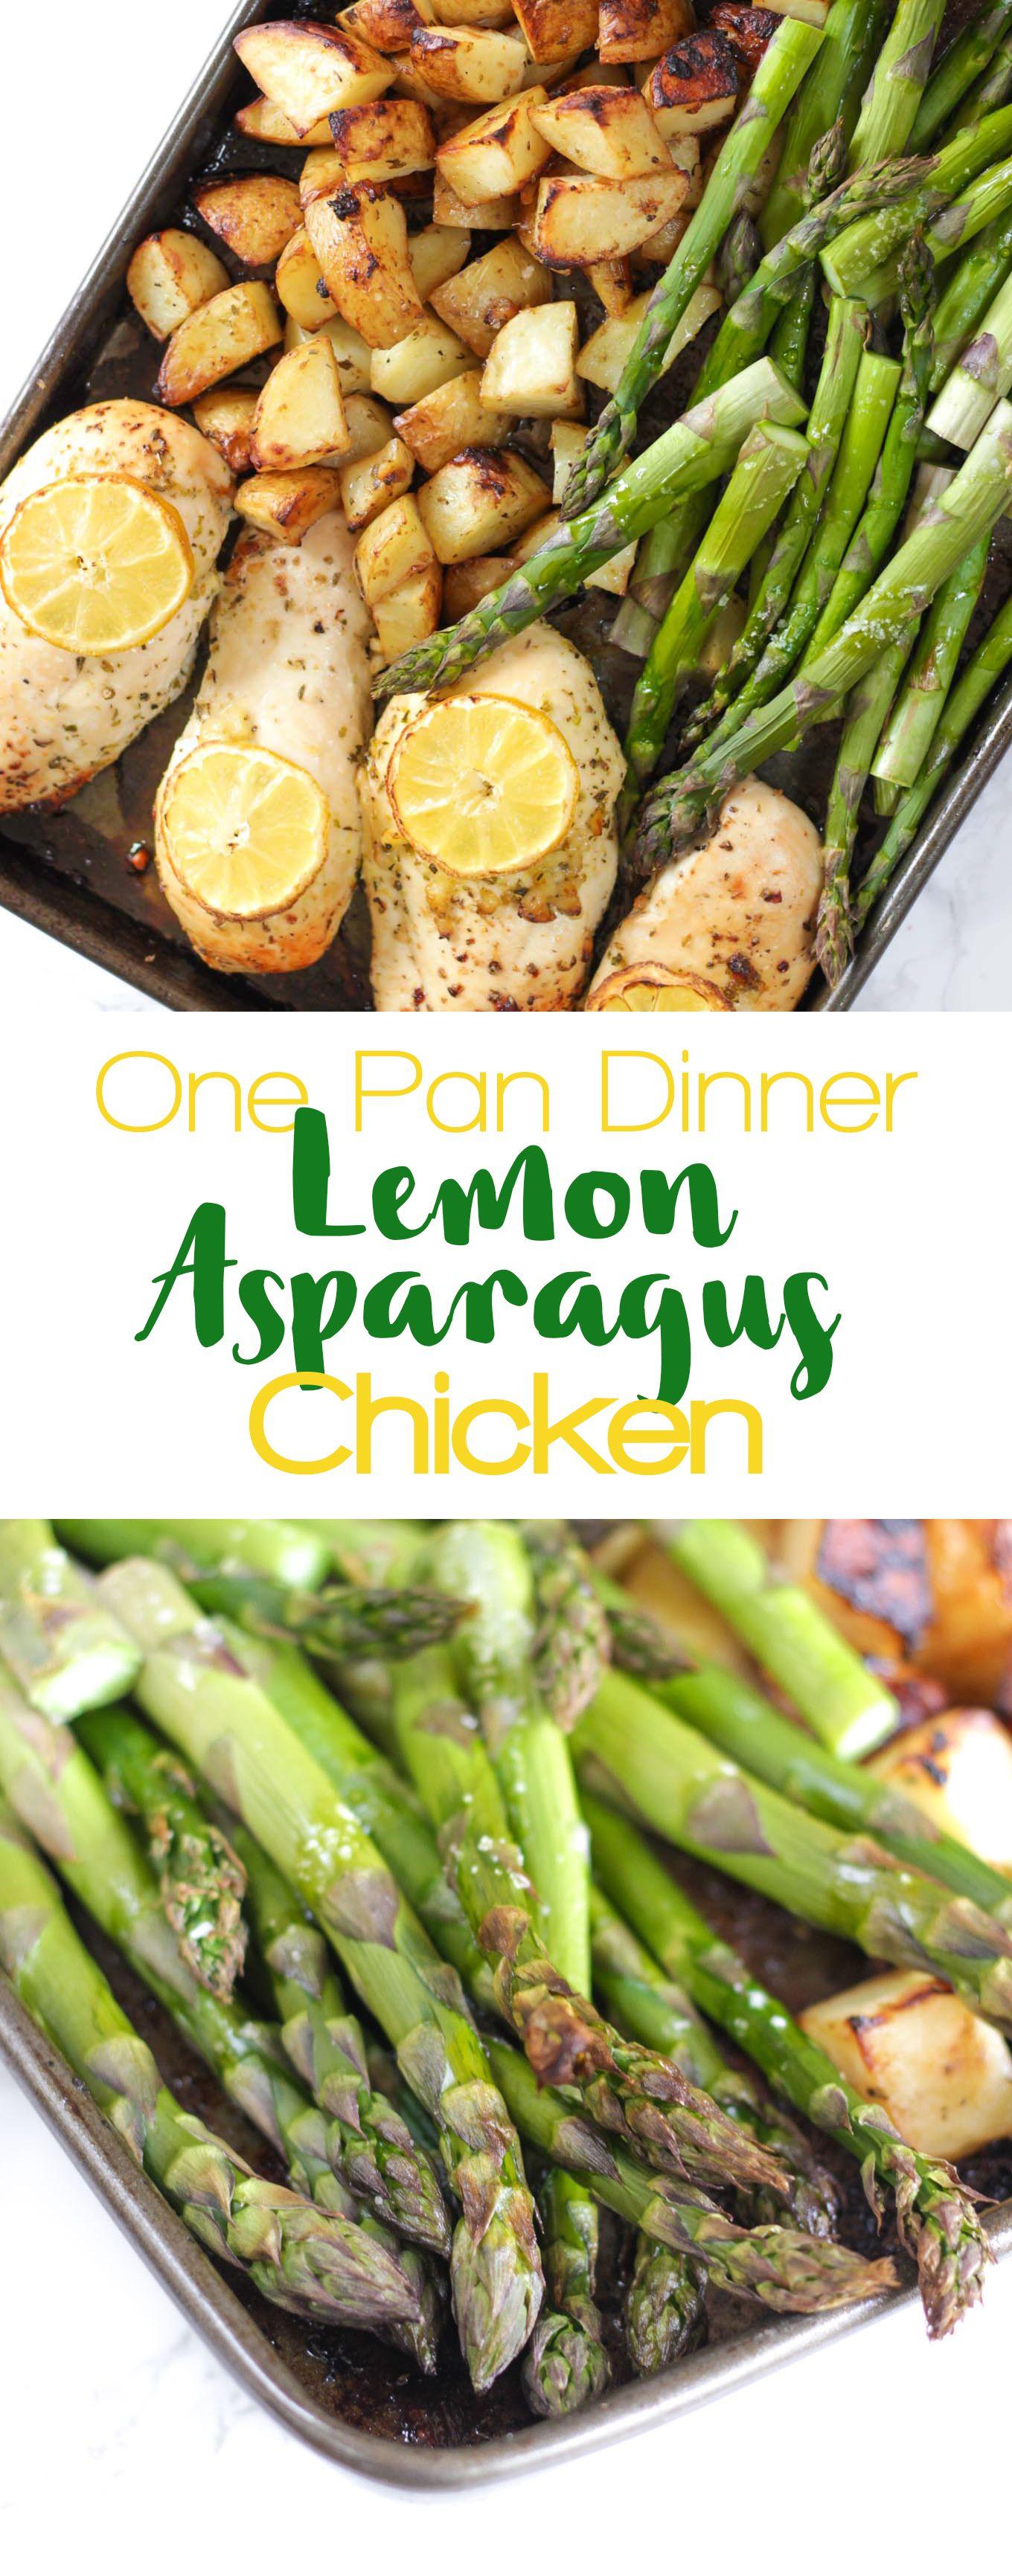 One Pan Lemon Asparagus Chicken